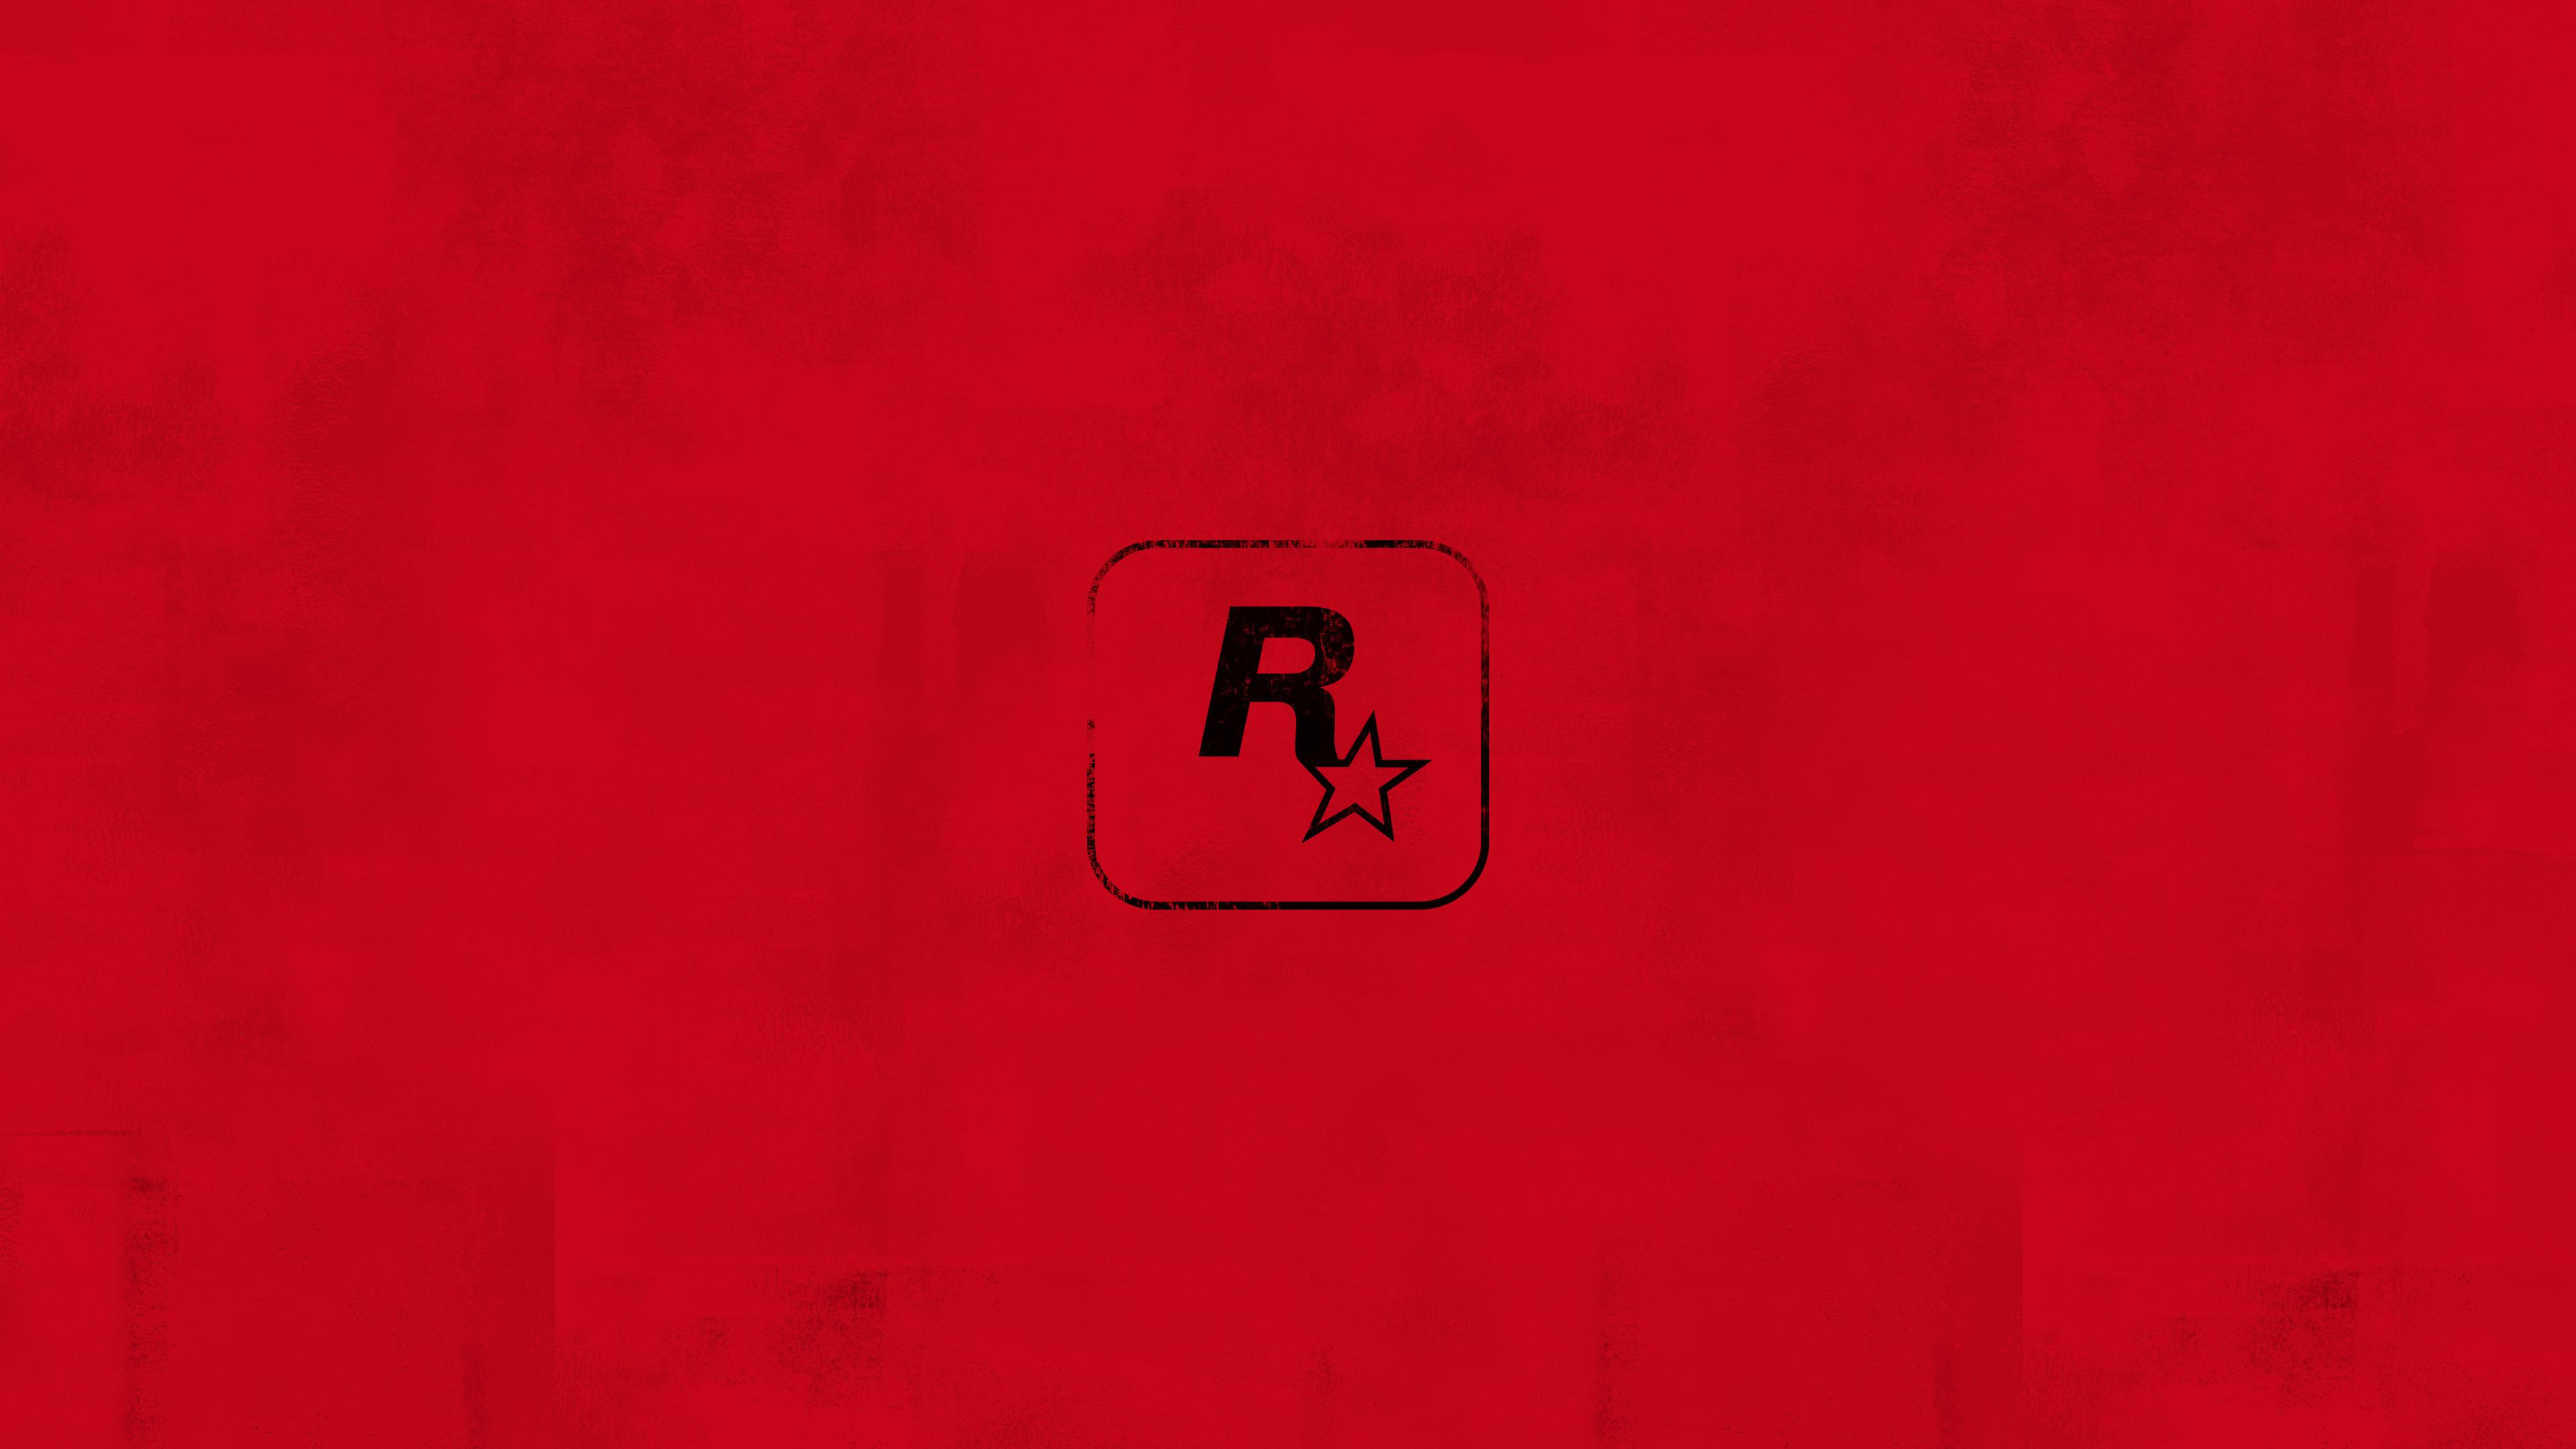 Red Dead Redemption 2 Red dead redemption, Read dead